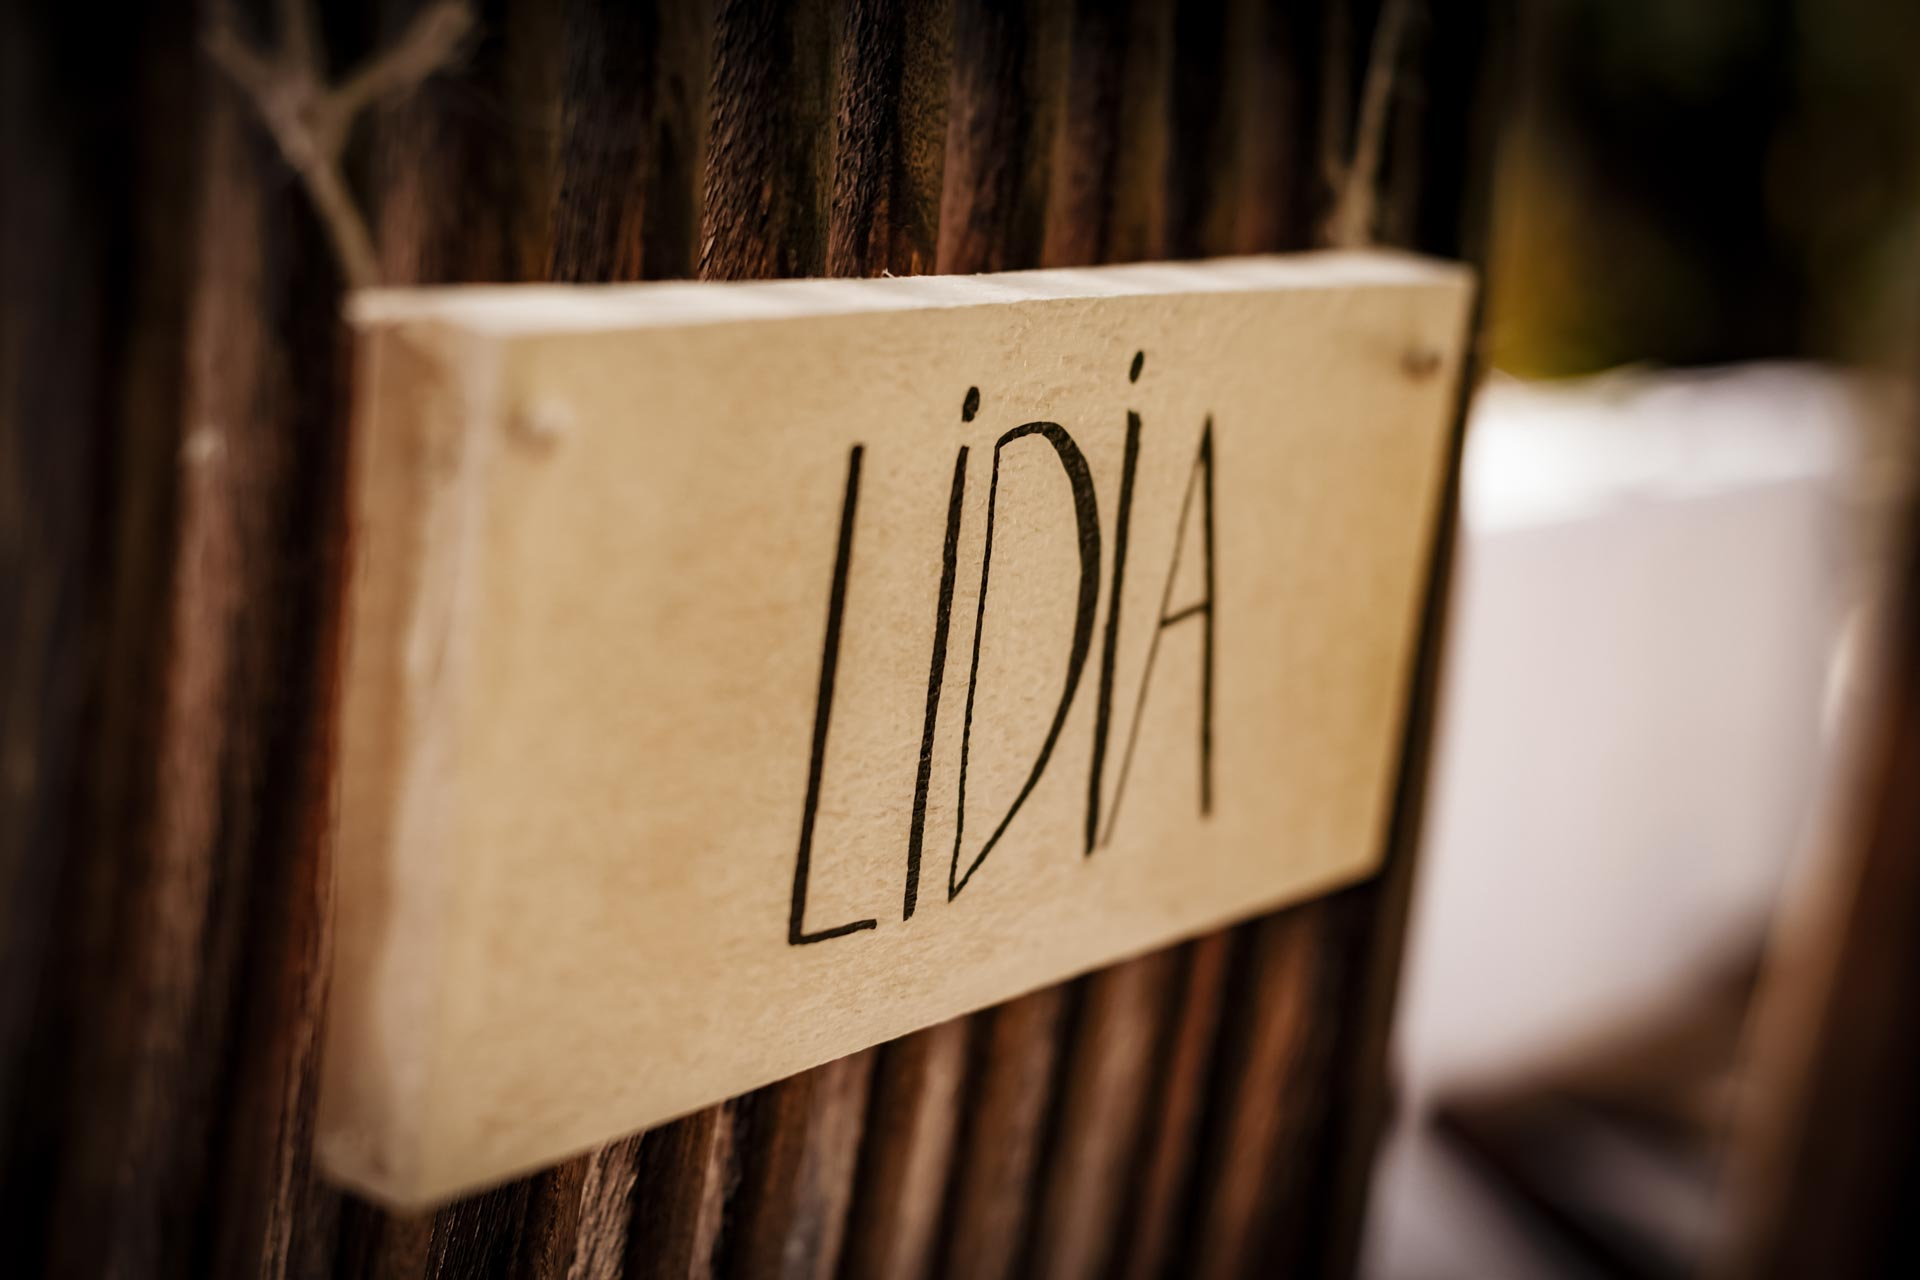 tubodarural.com Jose Luis & Lidia Lidia Jose Luis